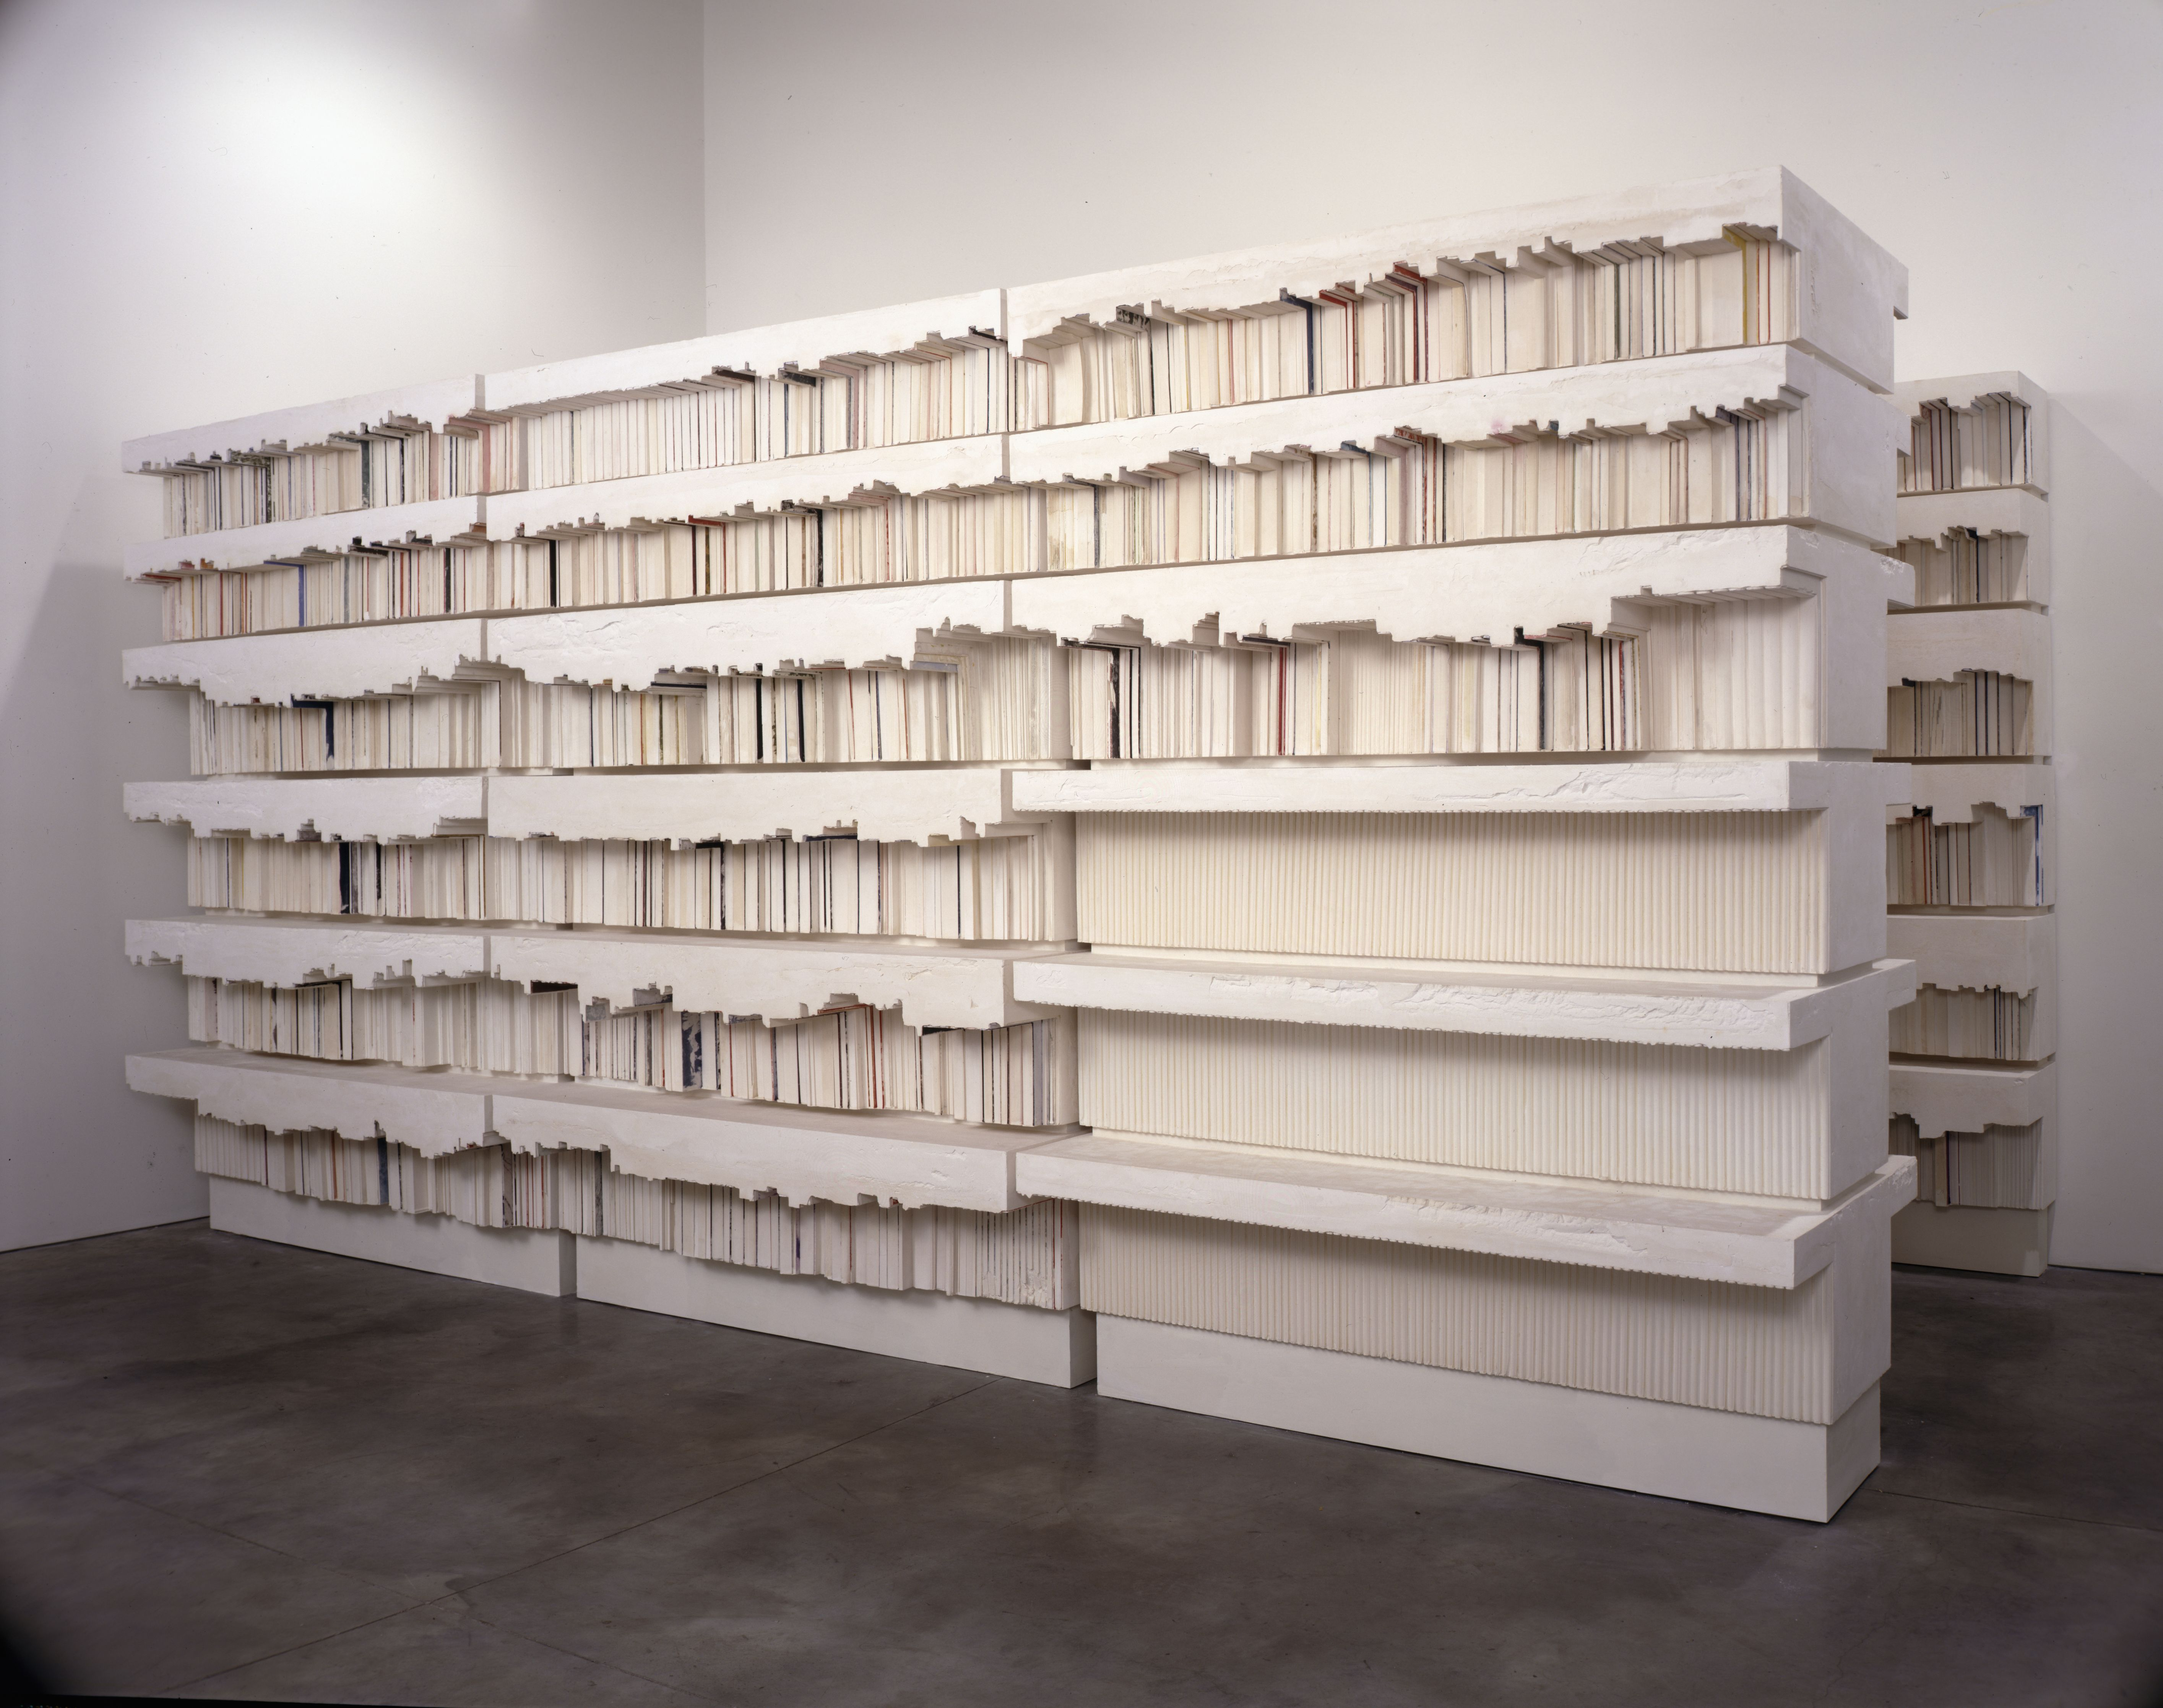 Untitled ( Book Corridors), 1997, Rachel Whiteread